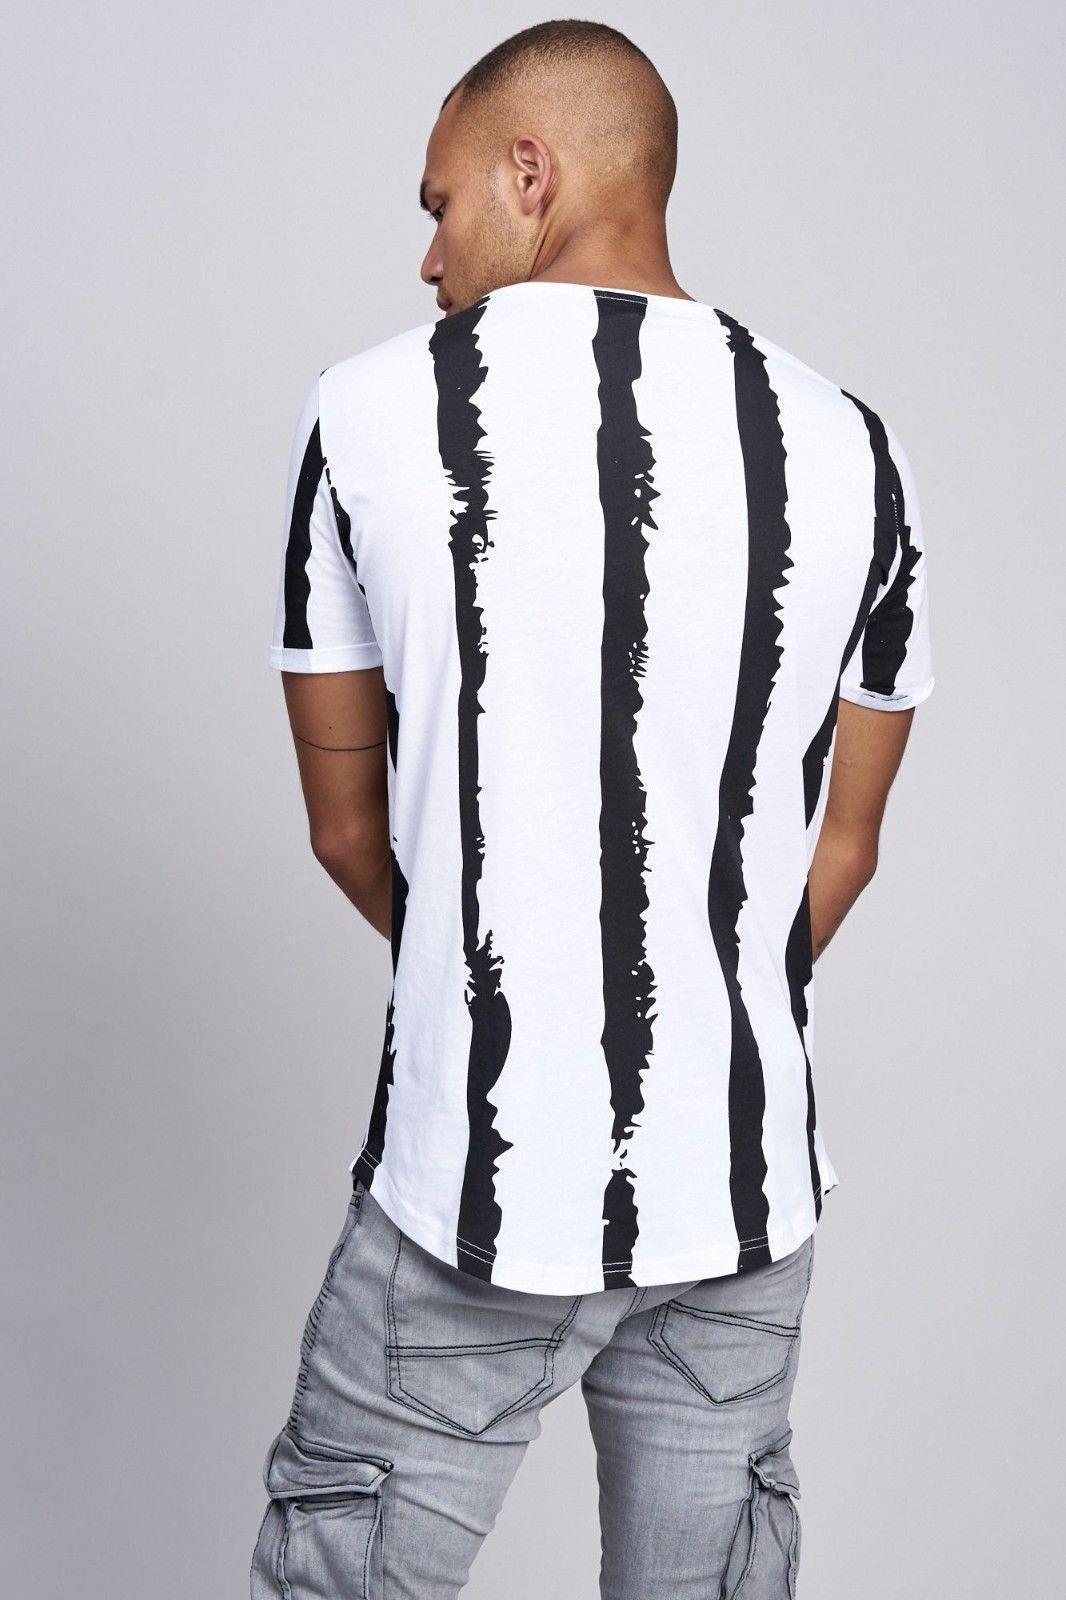 T-shirt-da-Uomo-Polo-Shirt-a-Maniche-Corte-printshirt-Polo-a-Maniche-Corte-17018-John-Kayna miniatura 11